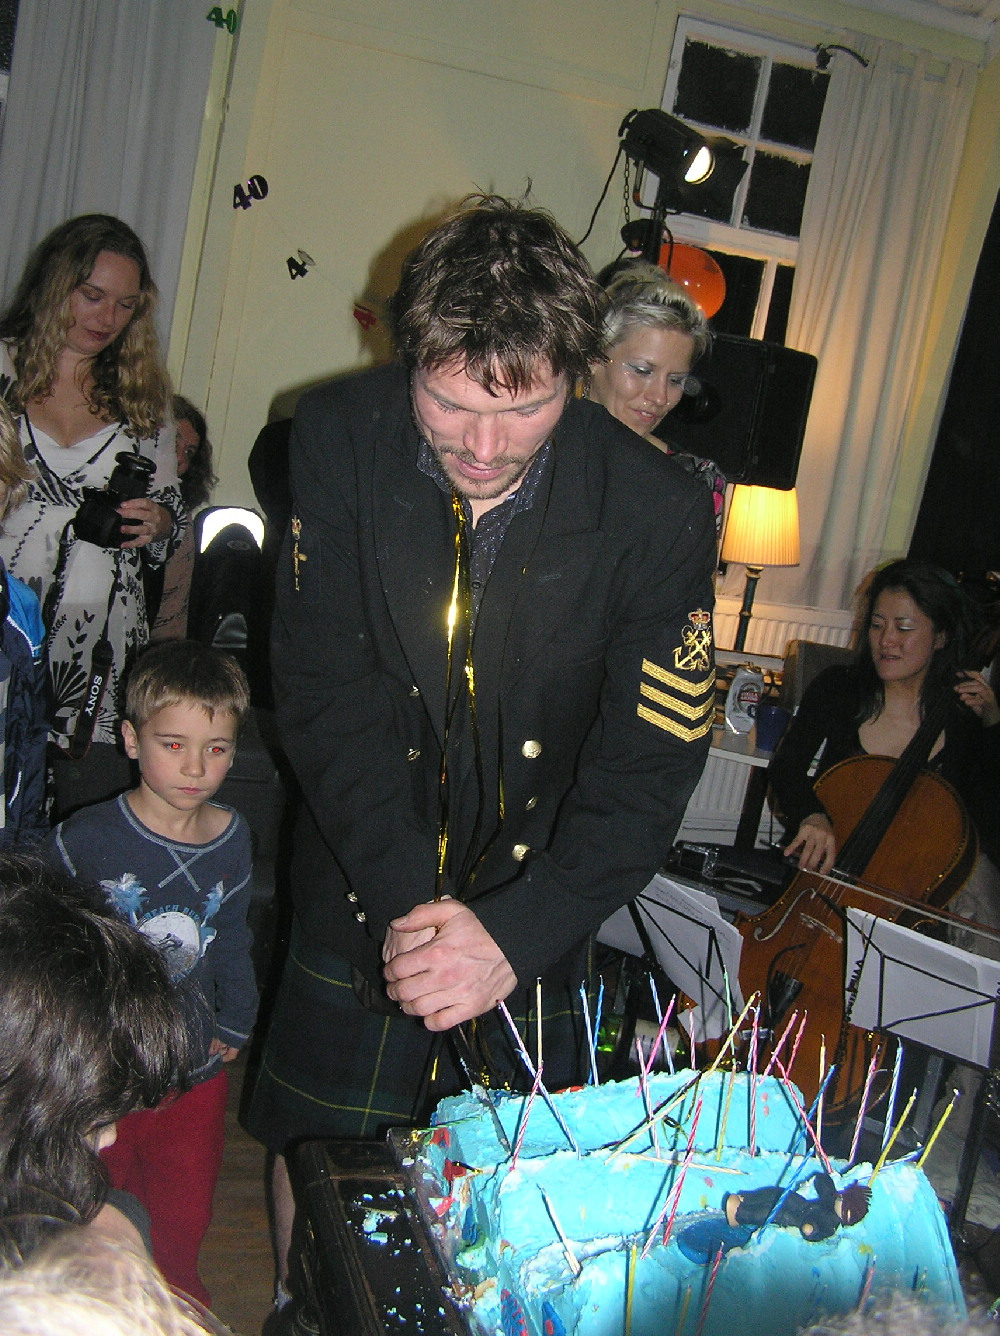 Conrad cutting his cake